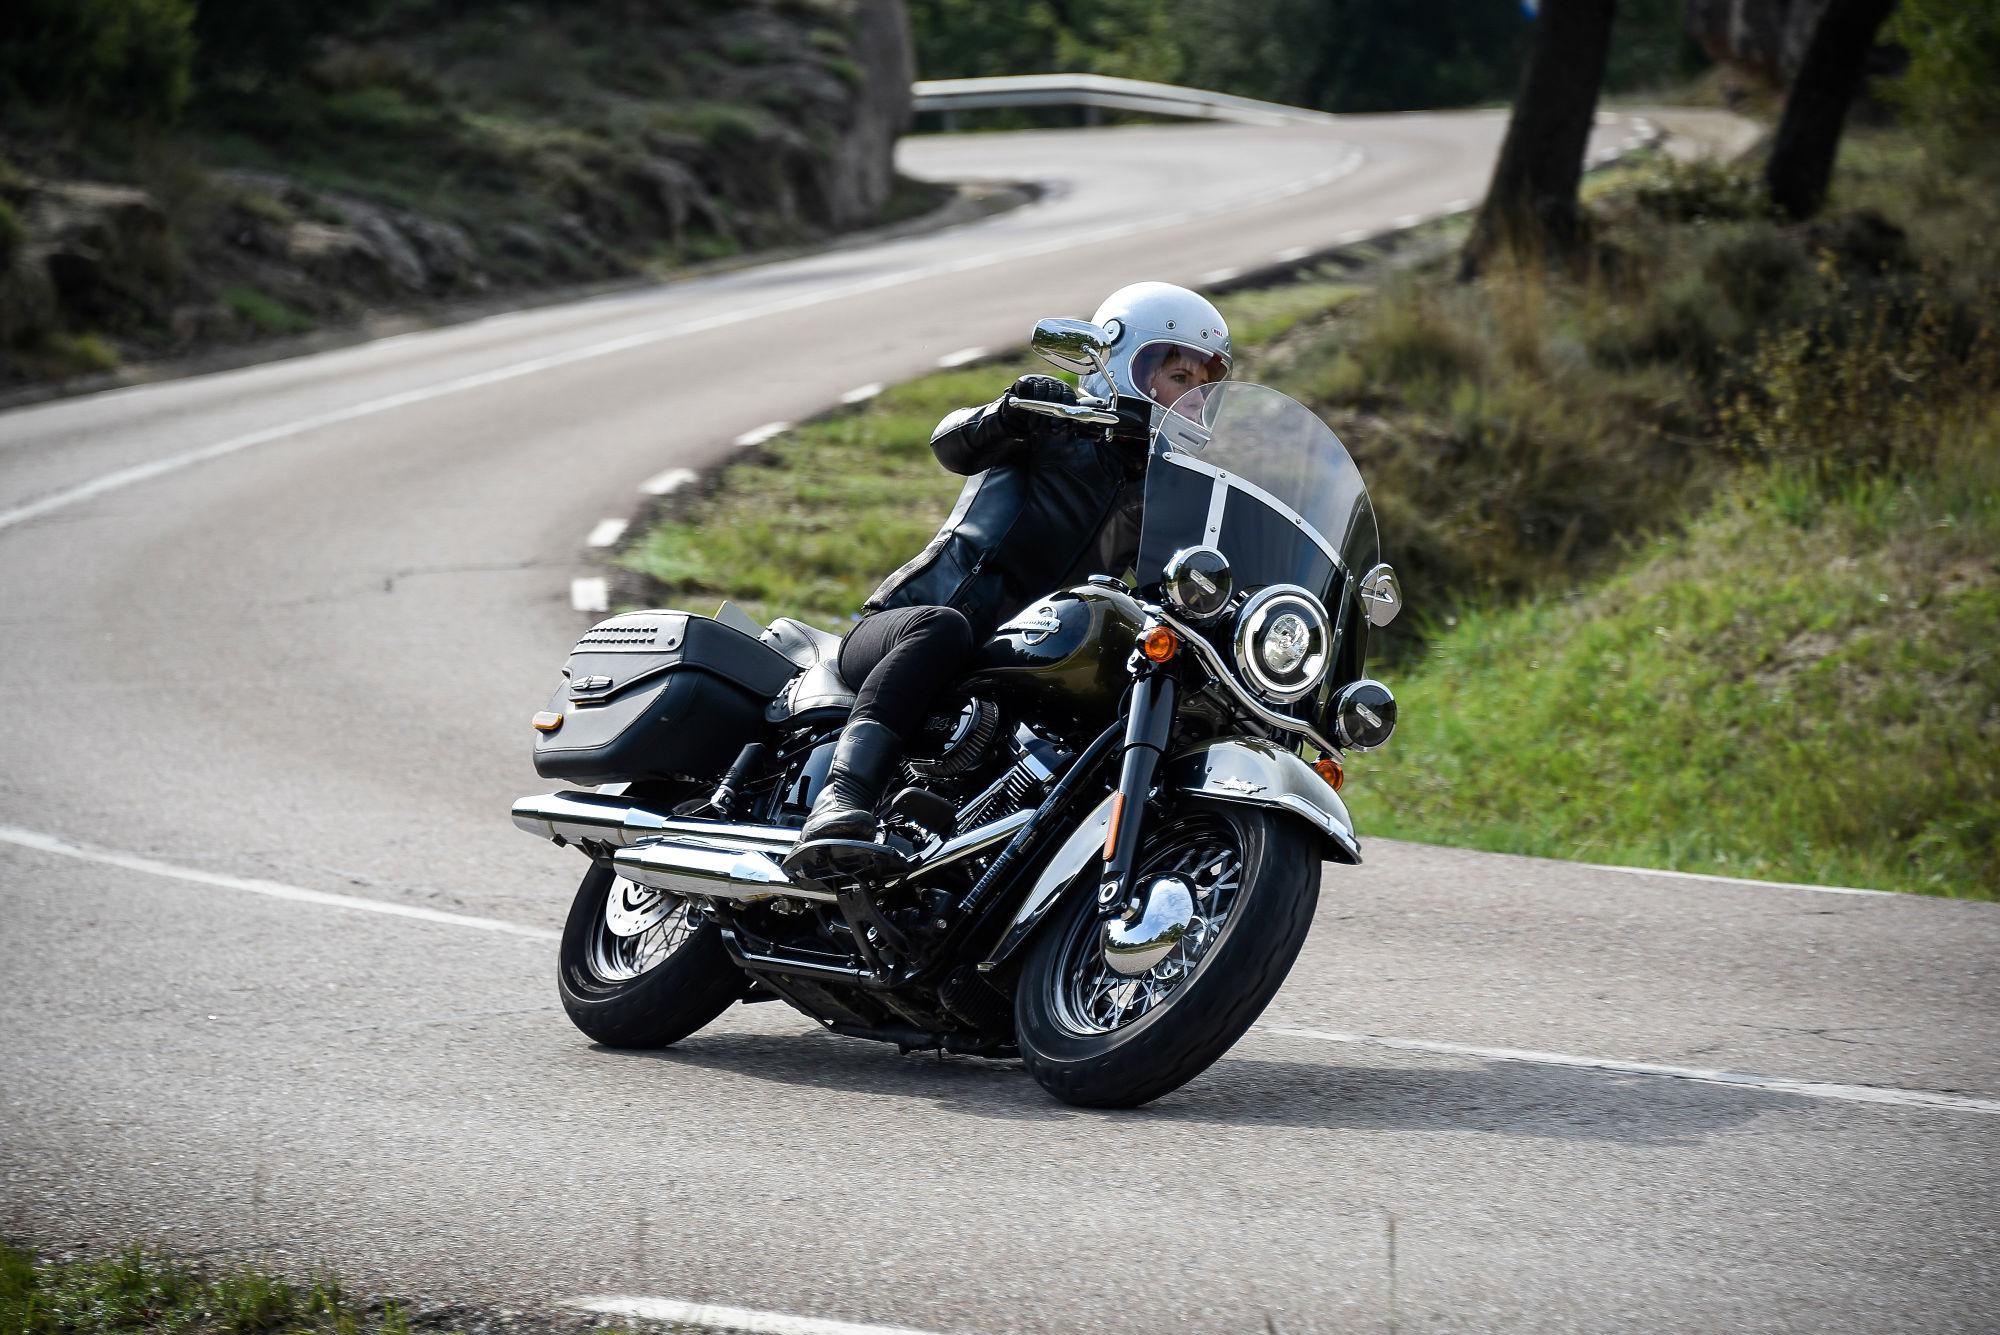 Harley Davidson Heritage Classic 114 Vid Visordown